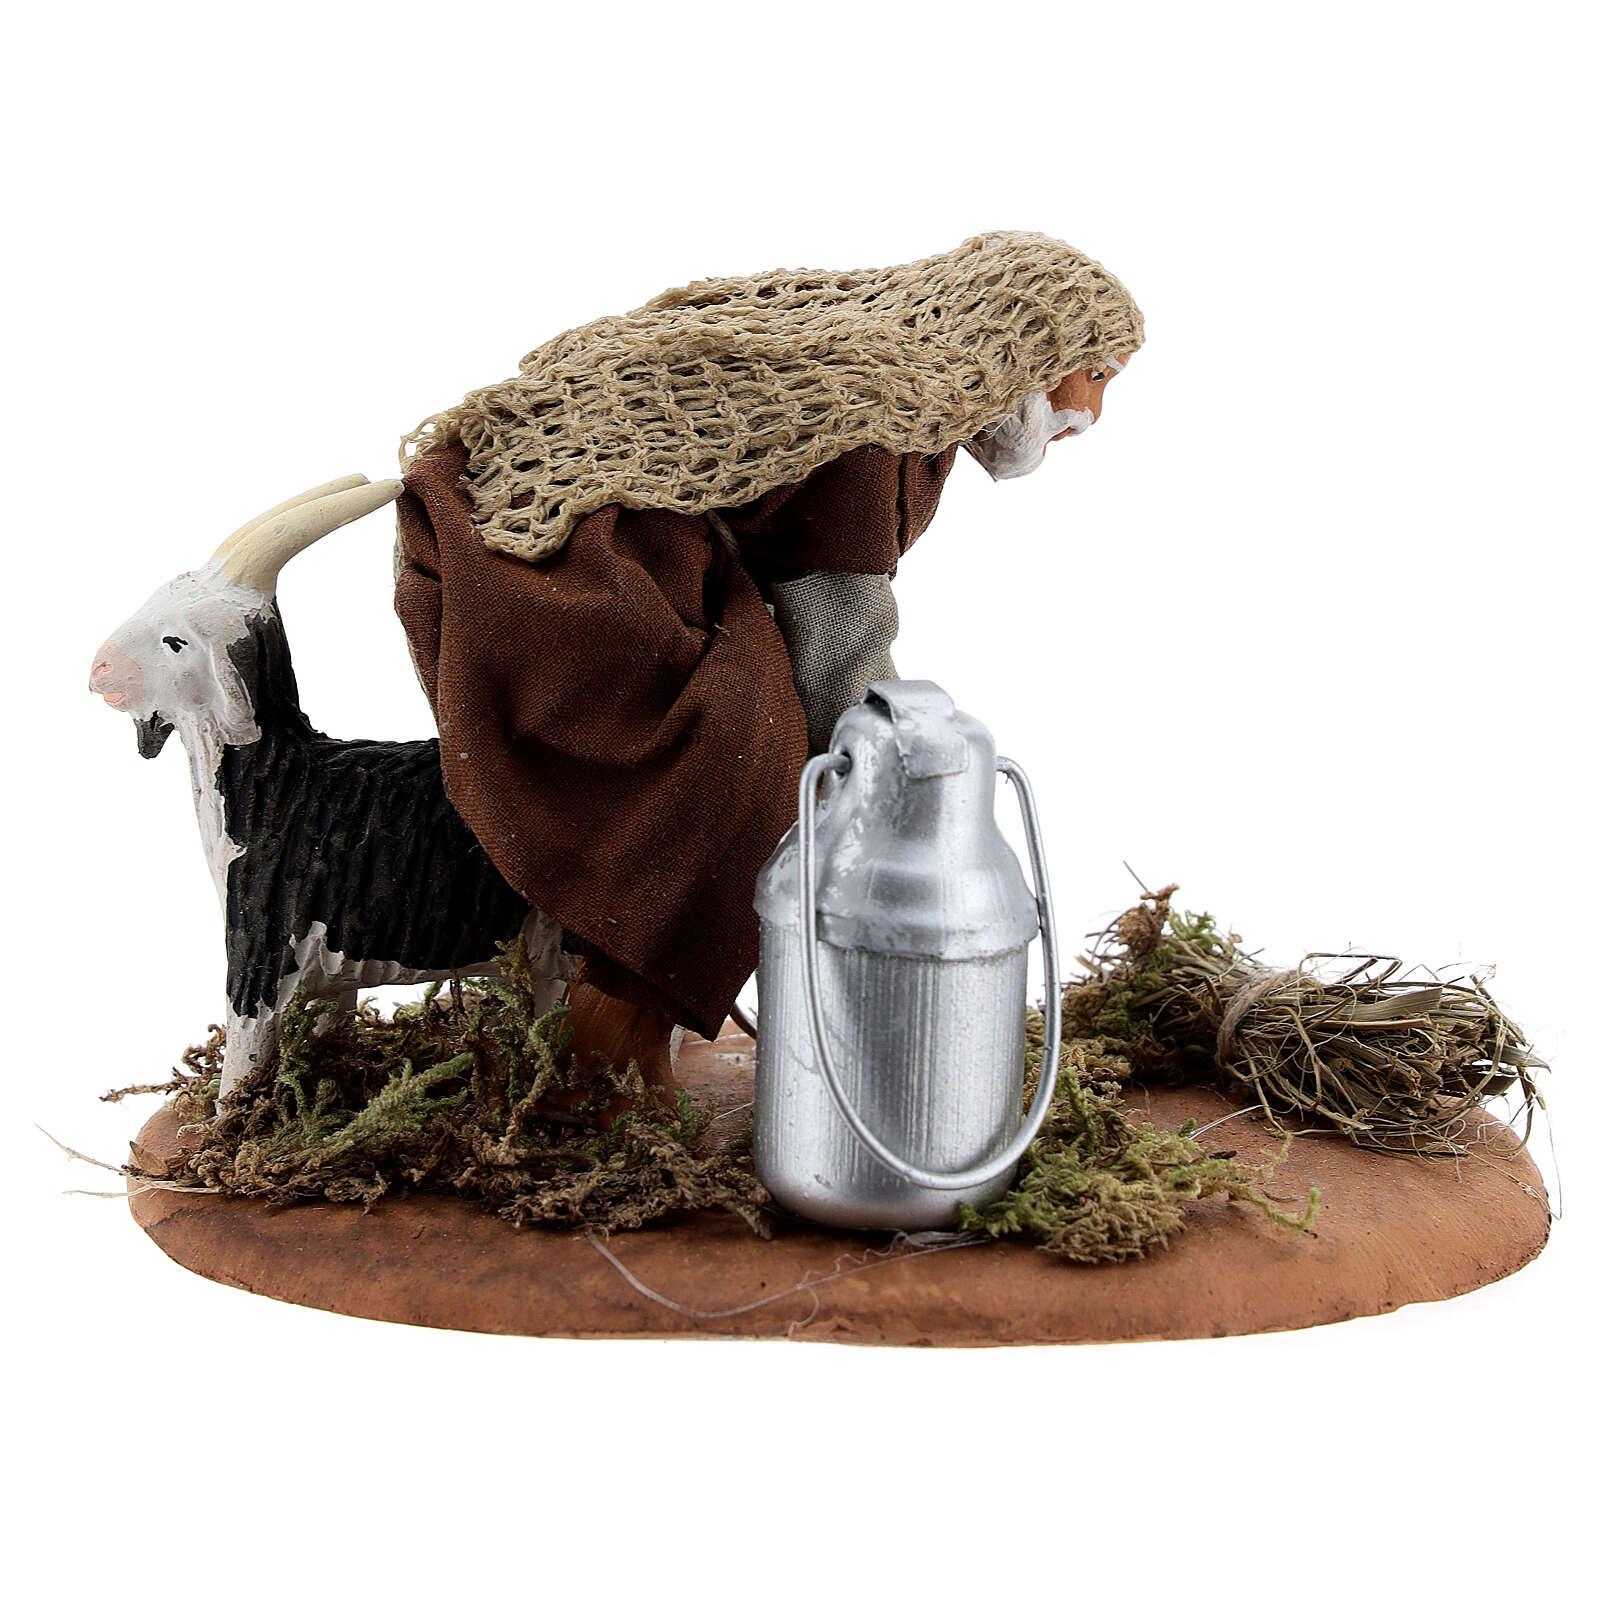 Shepherd milking goat Neapolitan nativity scene figurine 10 cm 4